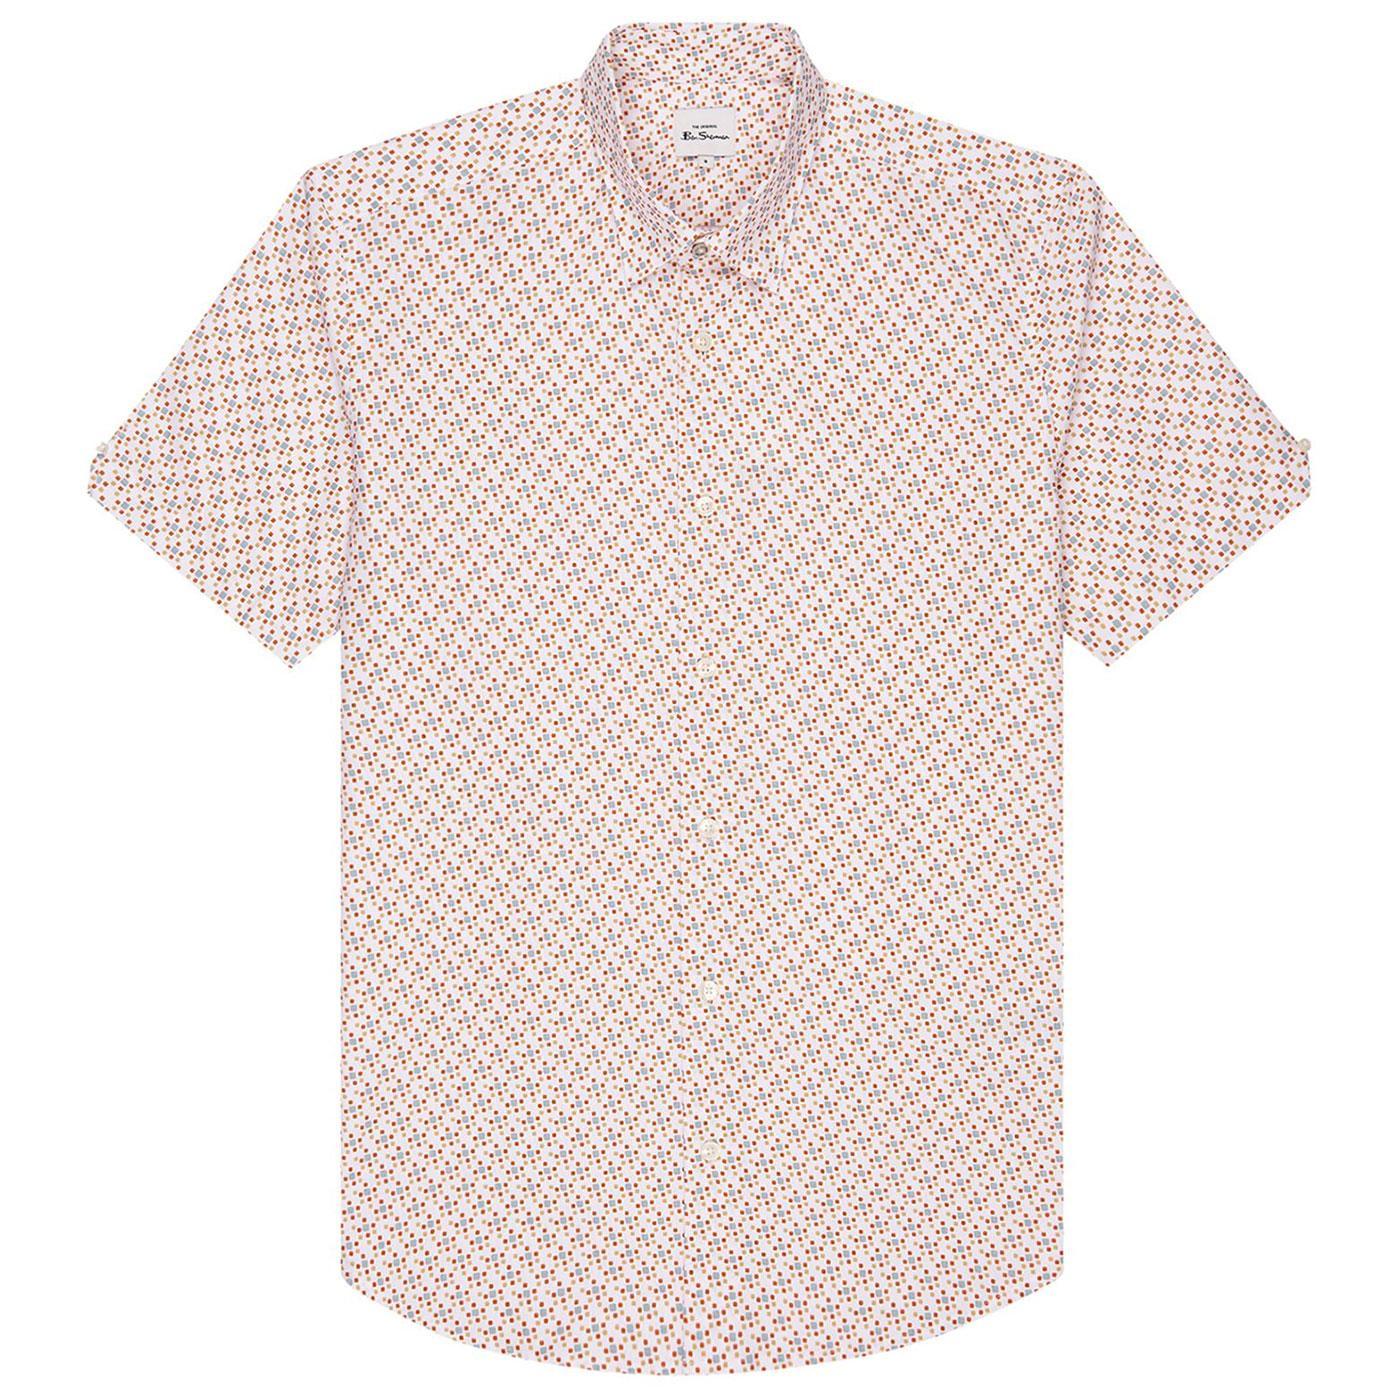 BEN SHERMAN Retro Mod 60s Faded Square Print Shirt